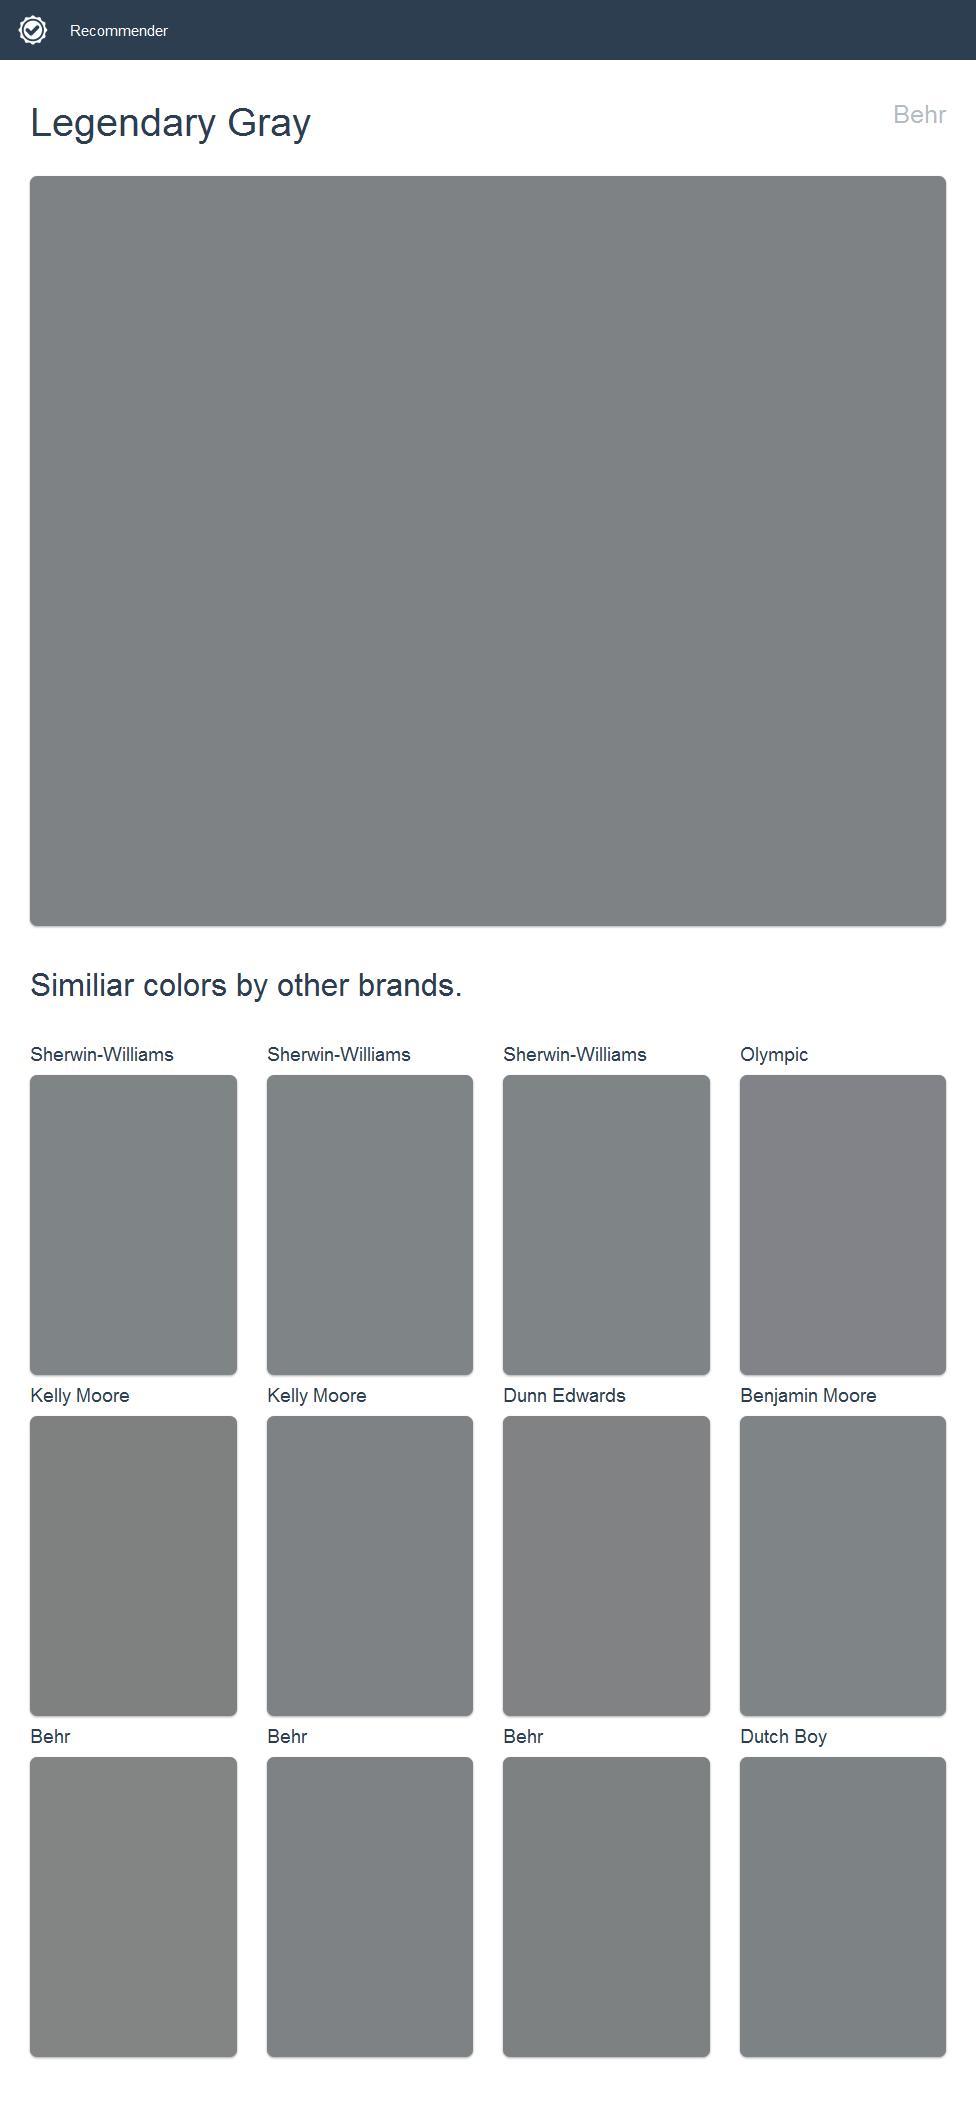 Behr Legendary Gray : legendary, Legendary, Gray,, Behr., Click, Image, Similiar, Colors, Other, Brands., Glidden, Paint,, Edwards